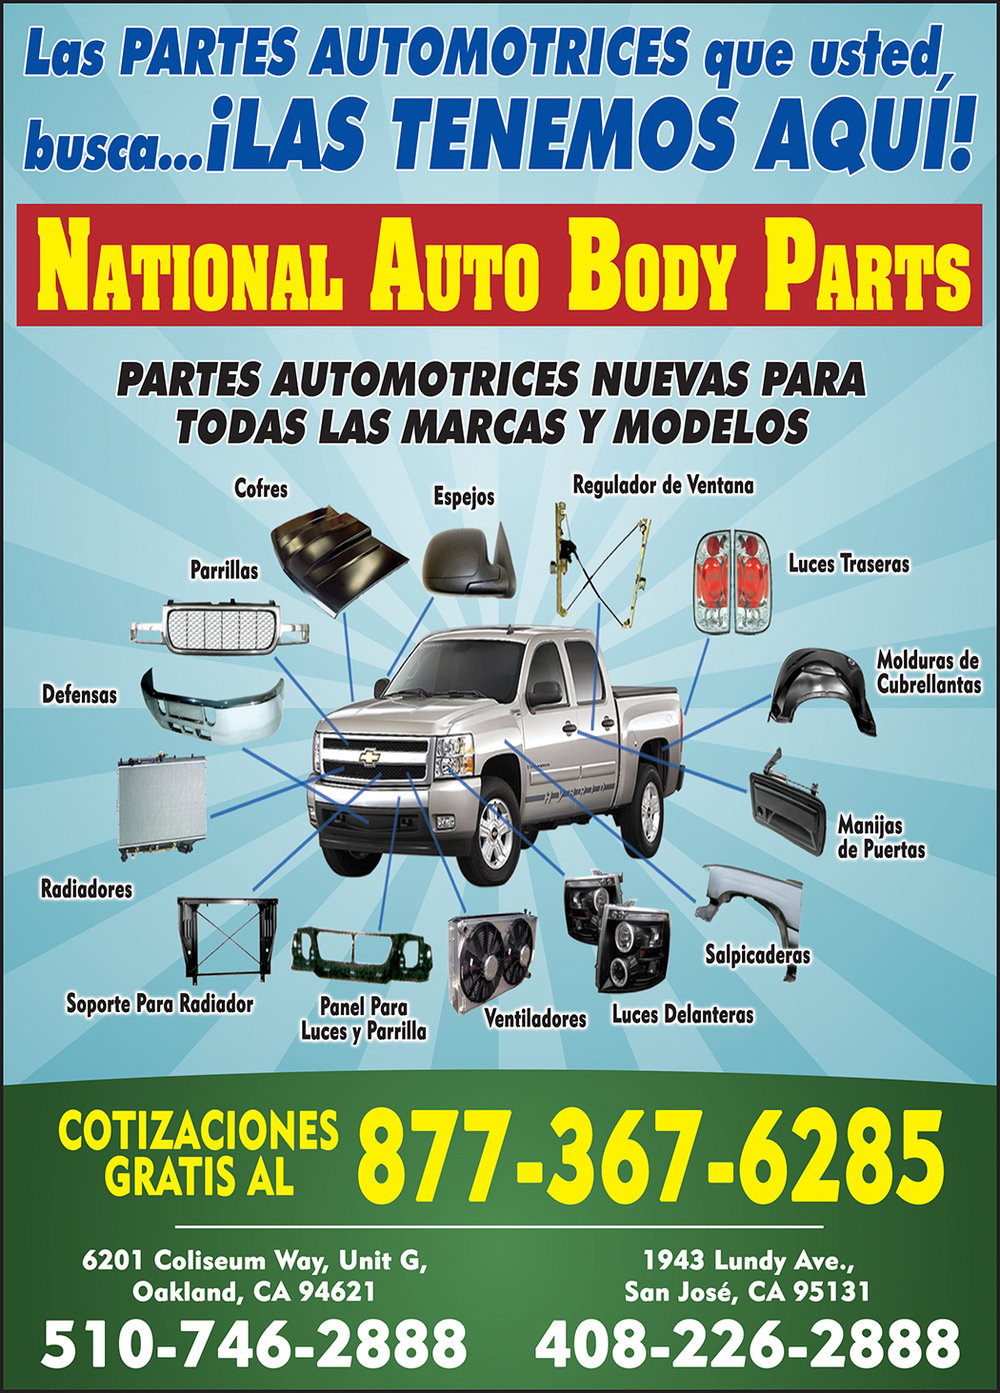 National Auto Body Parts 1 PAG Agosto 2018 copy.jpg